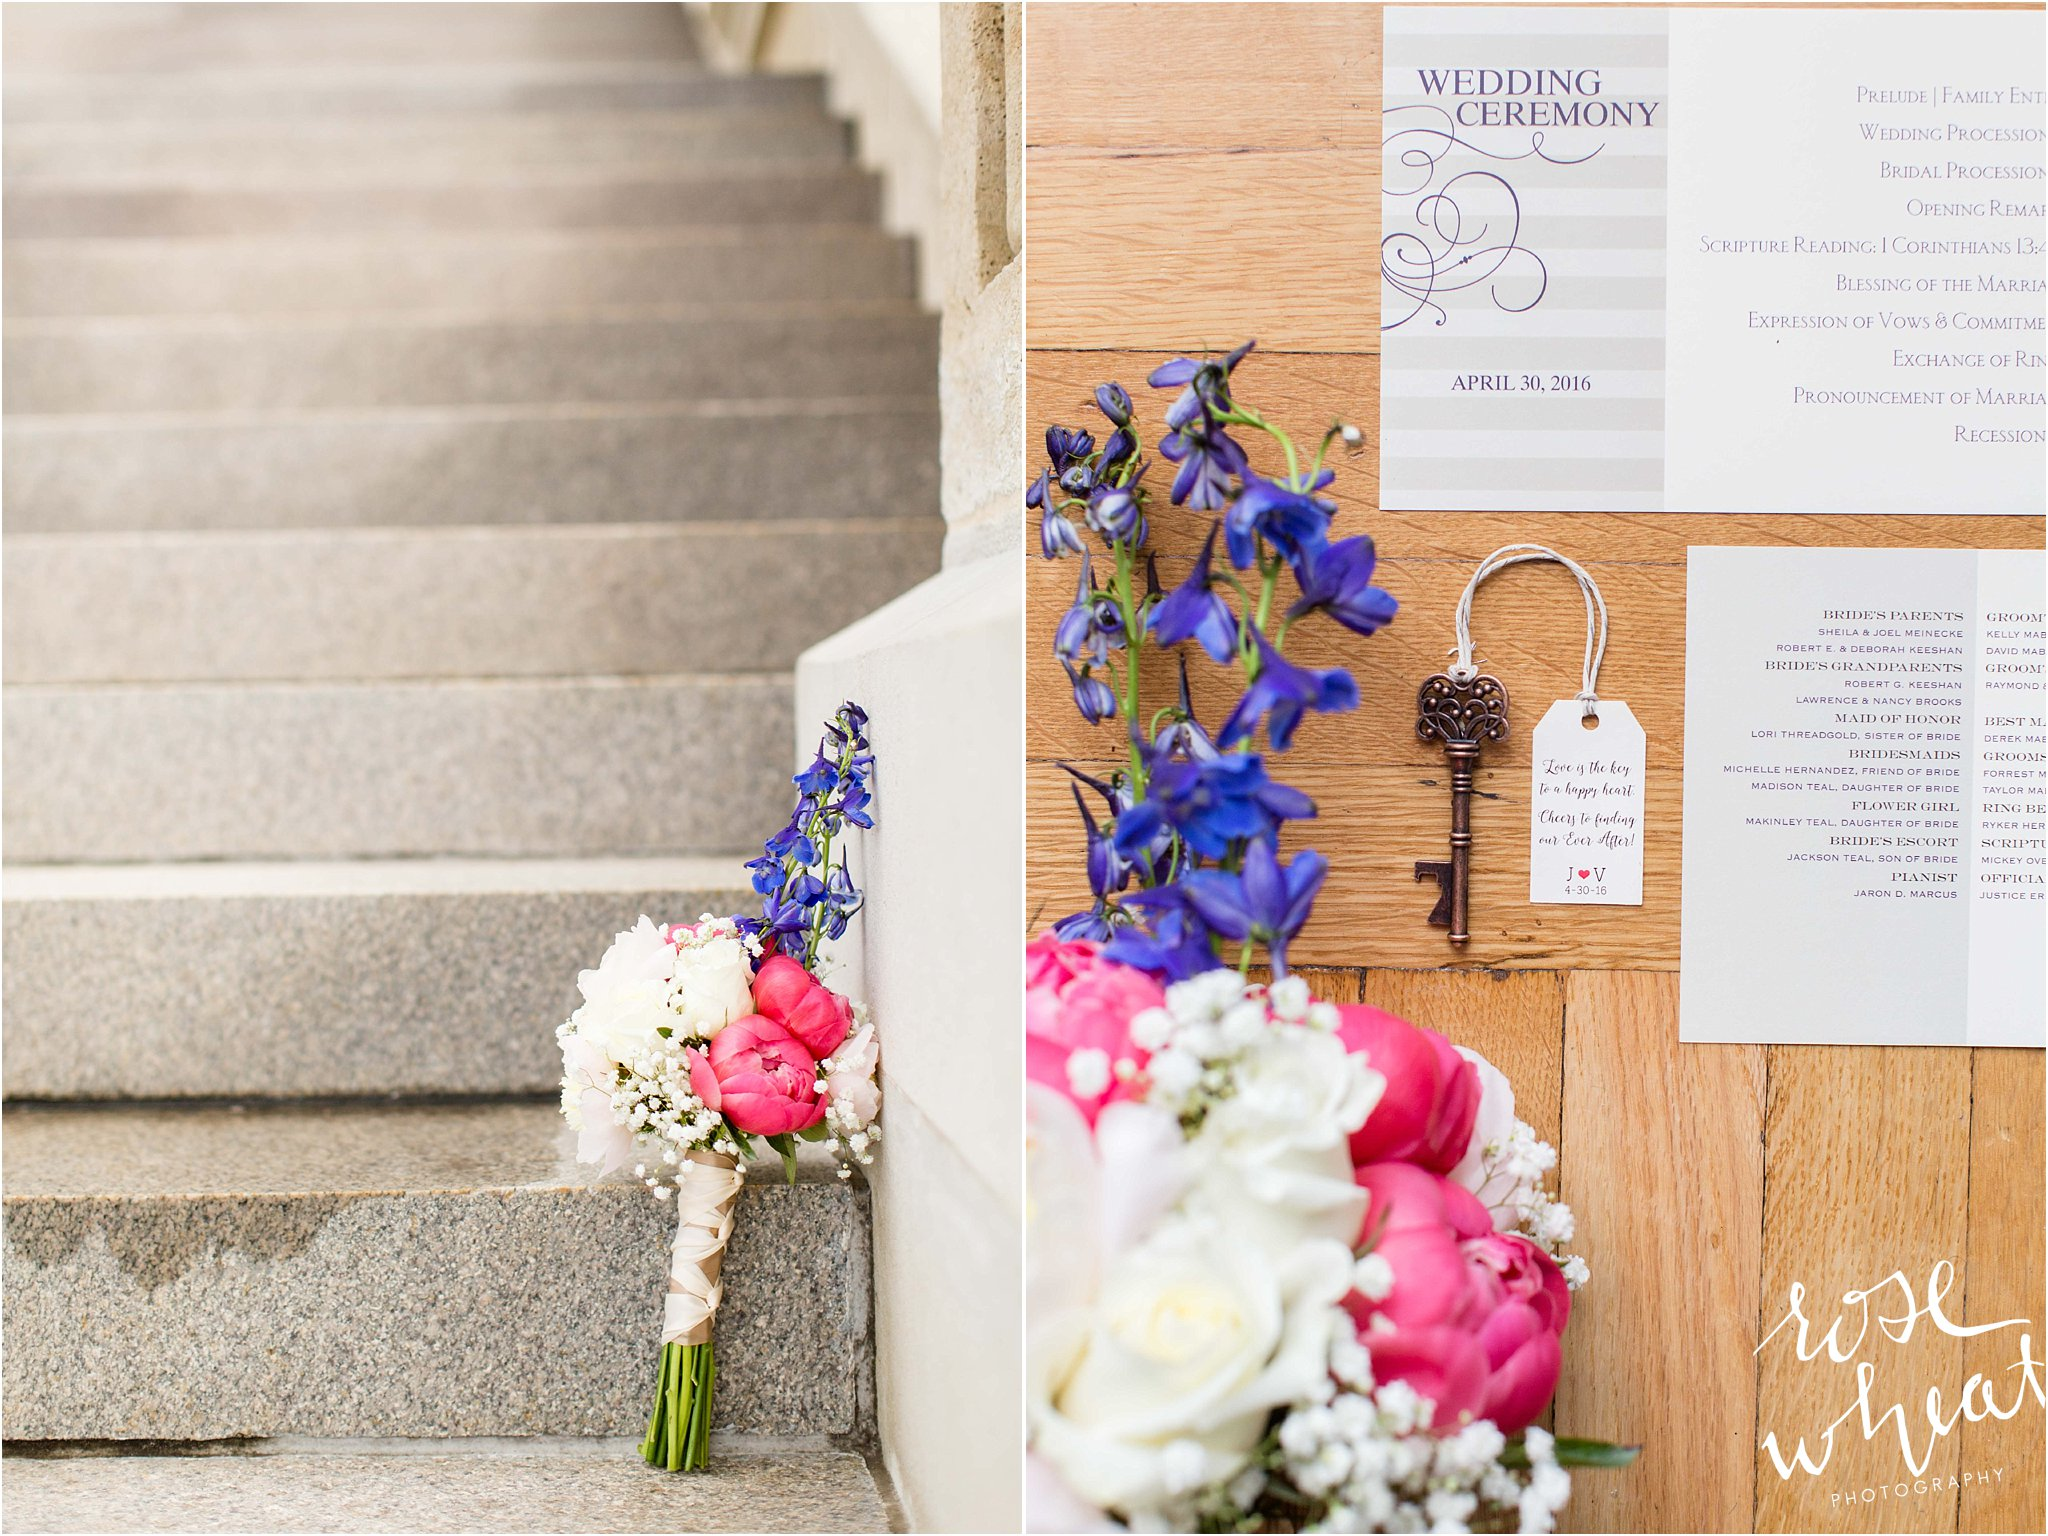 peony bouquet key bottle opener weddingf favor.JPG